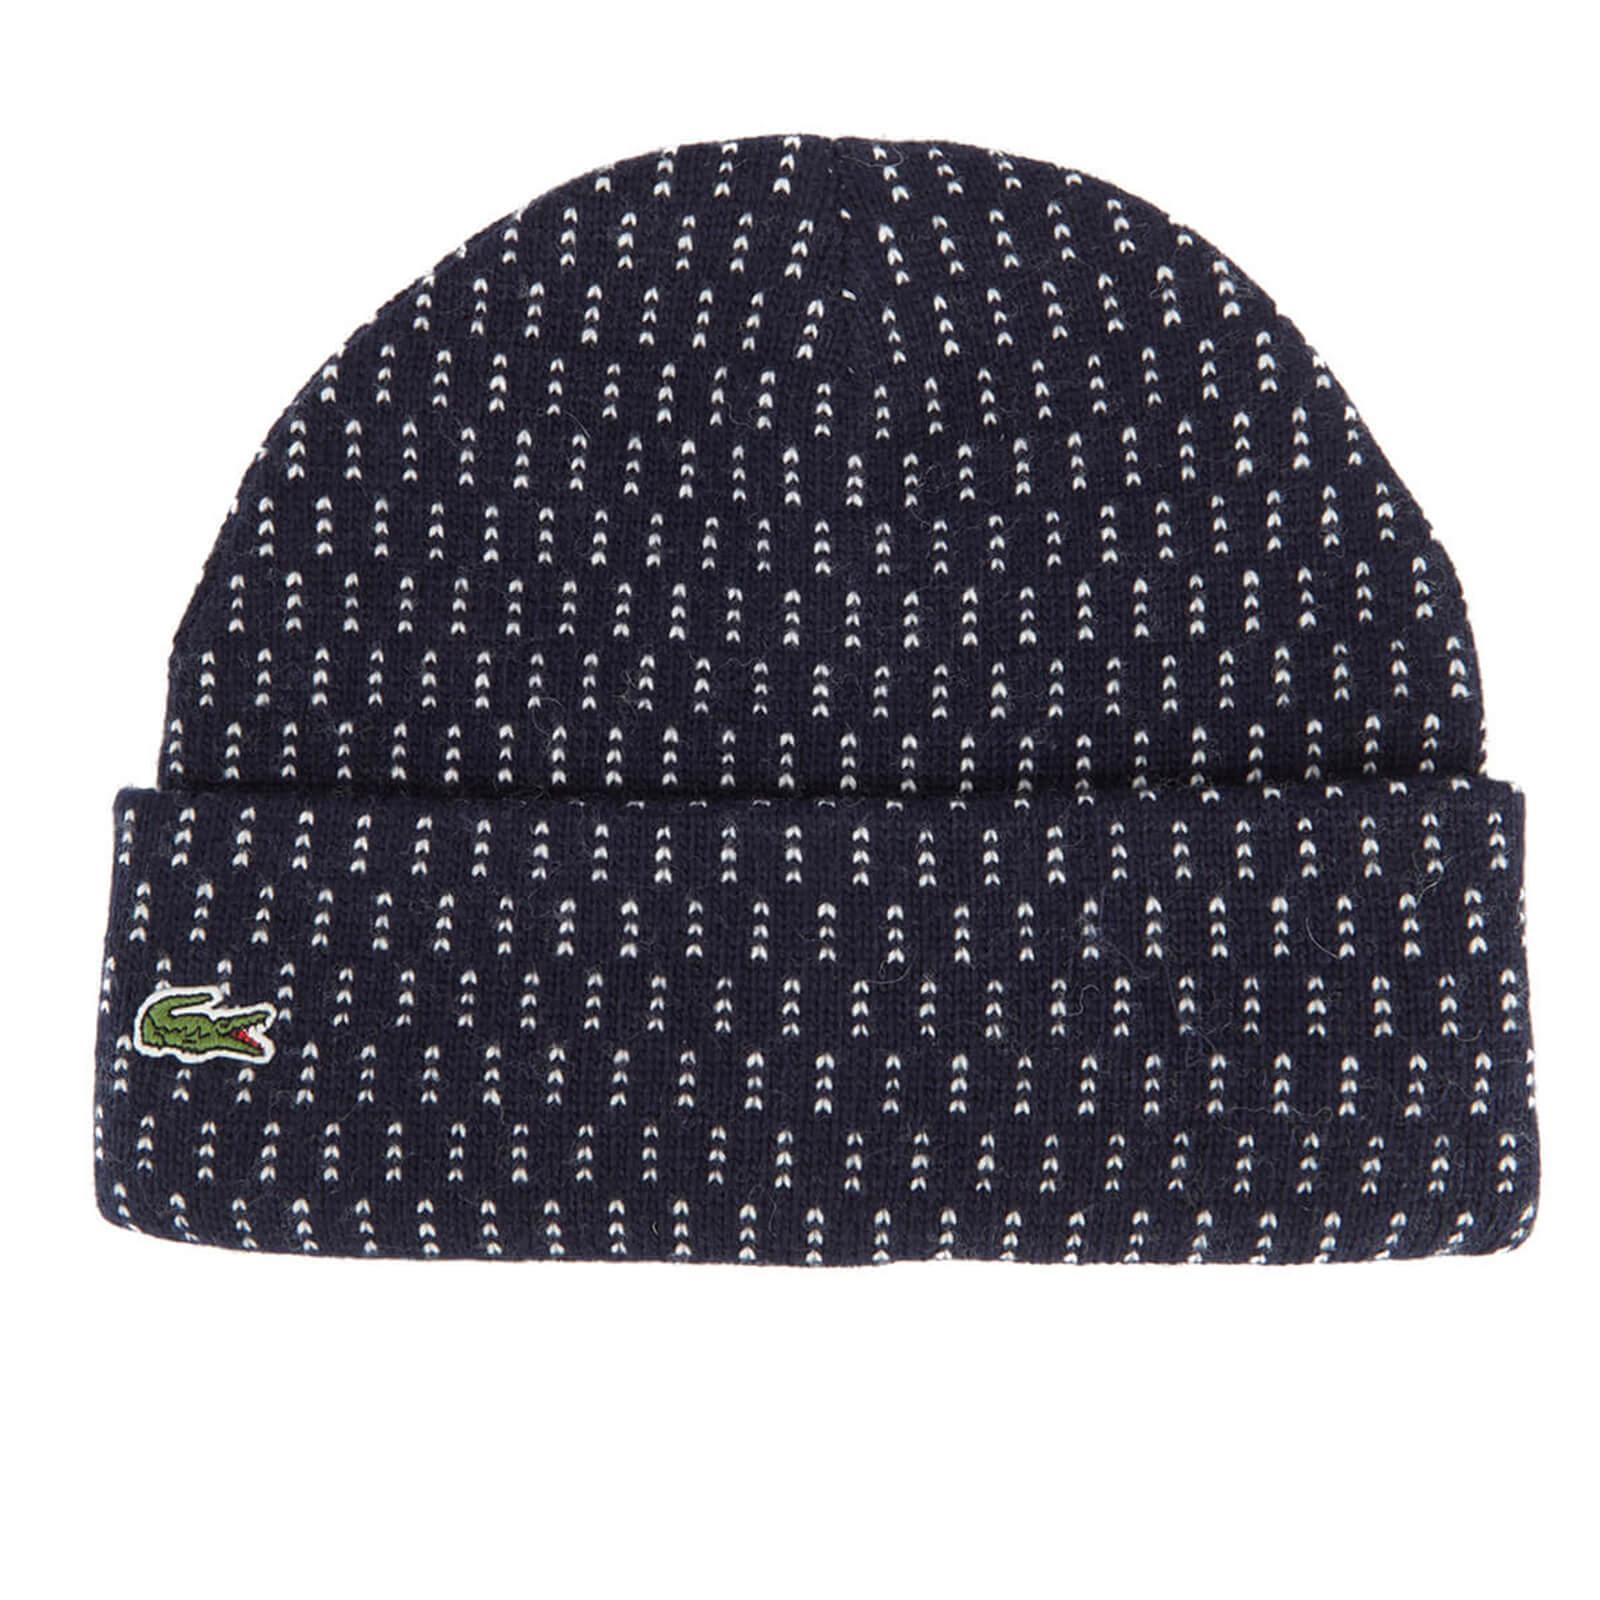 111a29c6 Lacoste L!ve Men's Ribbed Beanie Hat - Navy Blue/White